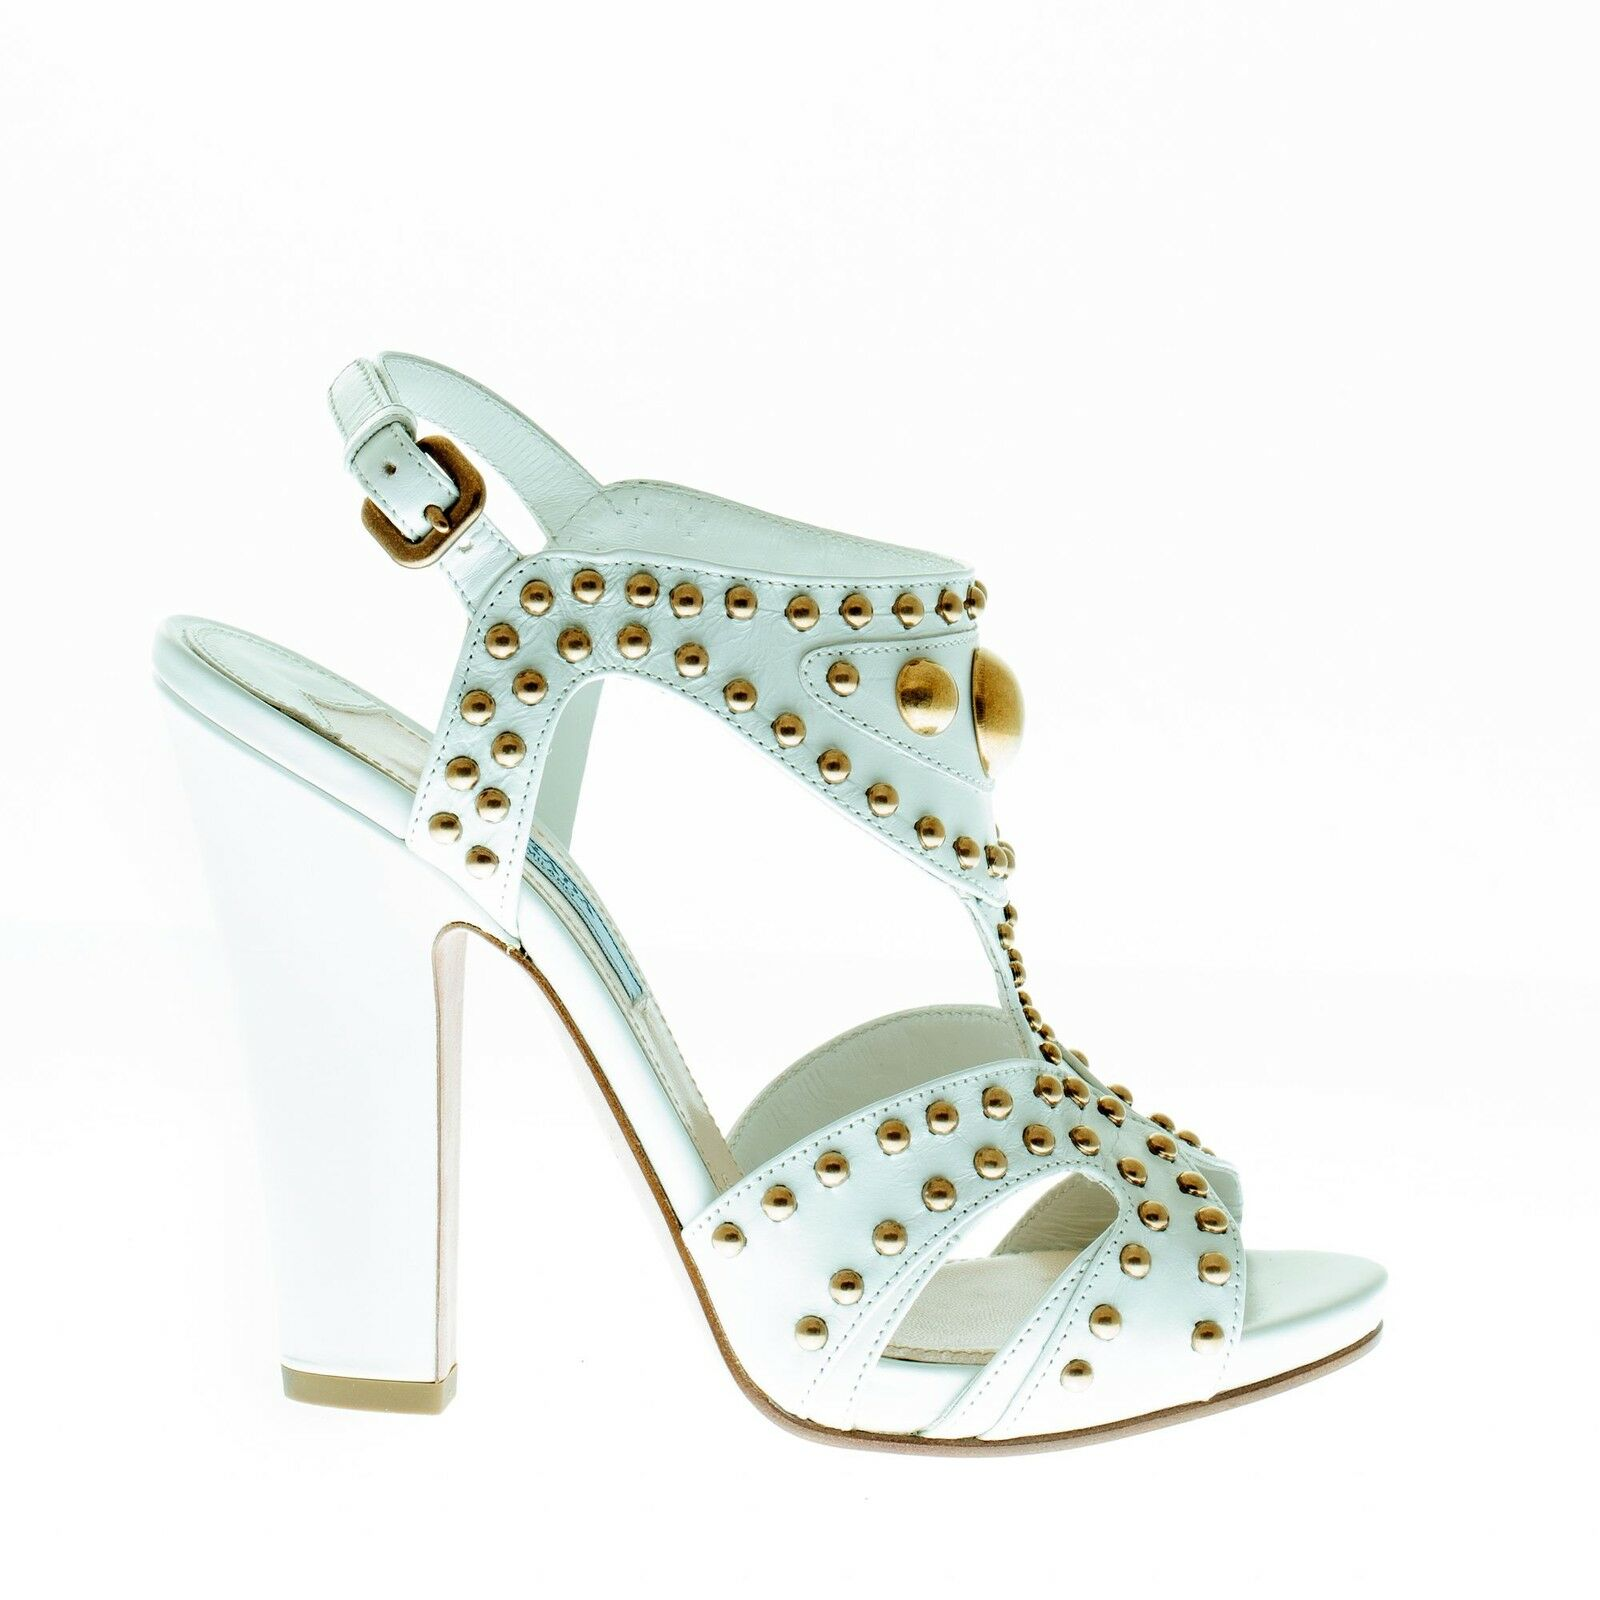 Prada Mujer Zapatos Talco Sandalias Sandalias Sandalias De Cuero Con Metal Dorado Tachas Trim  protección post-venta